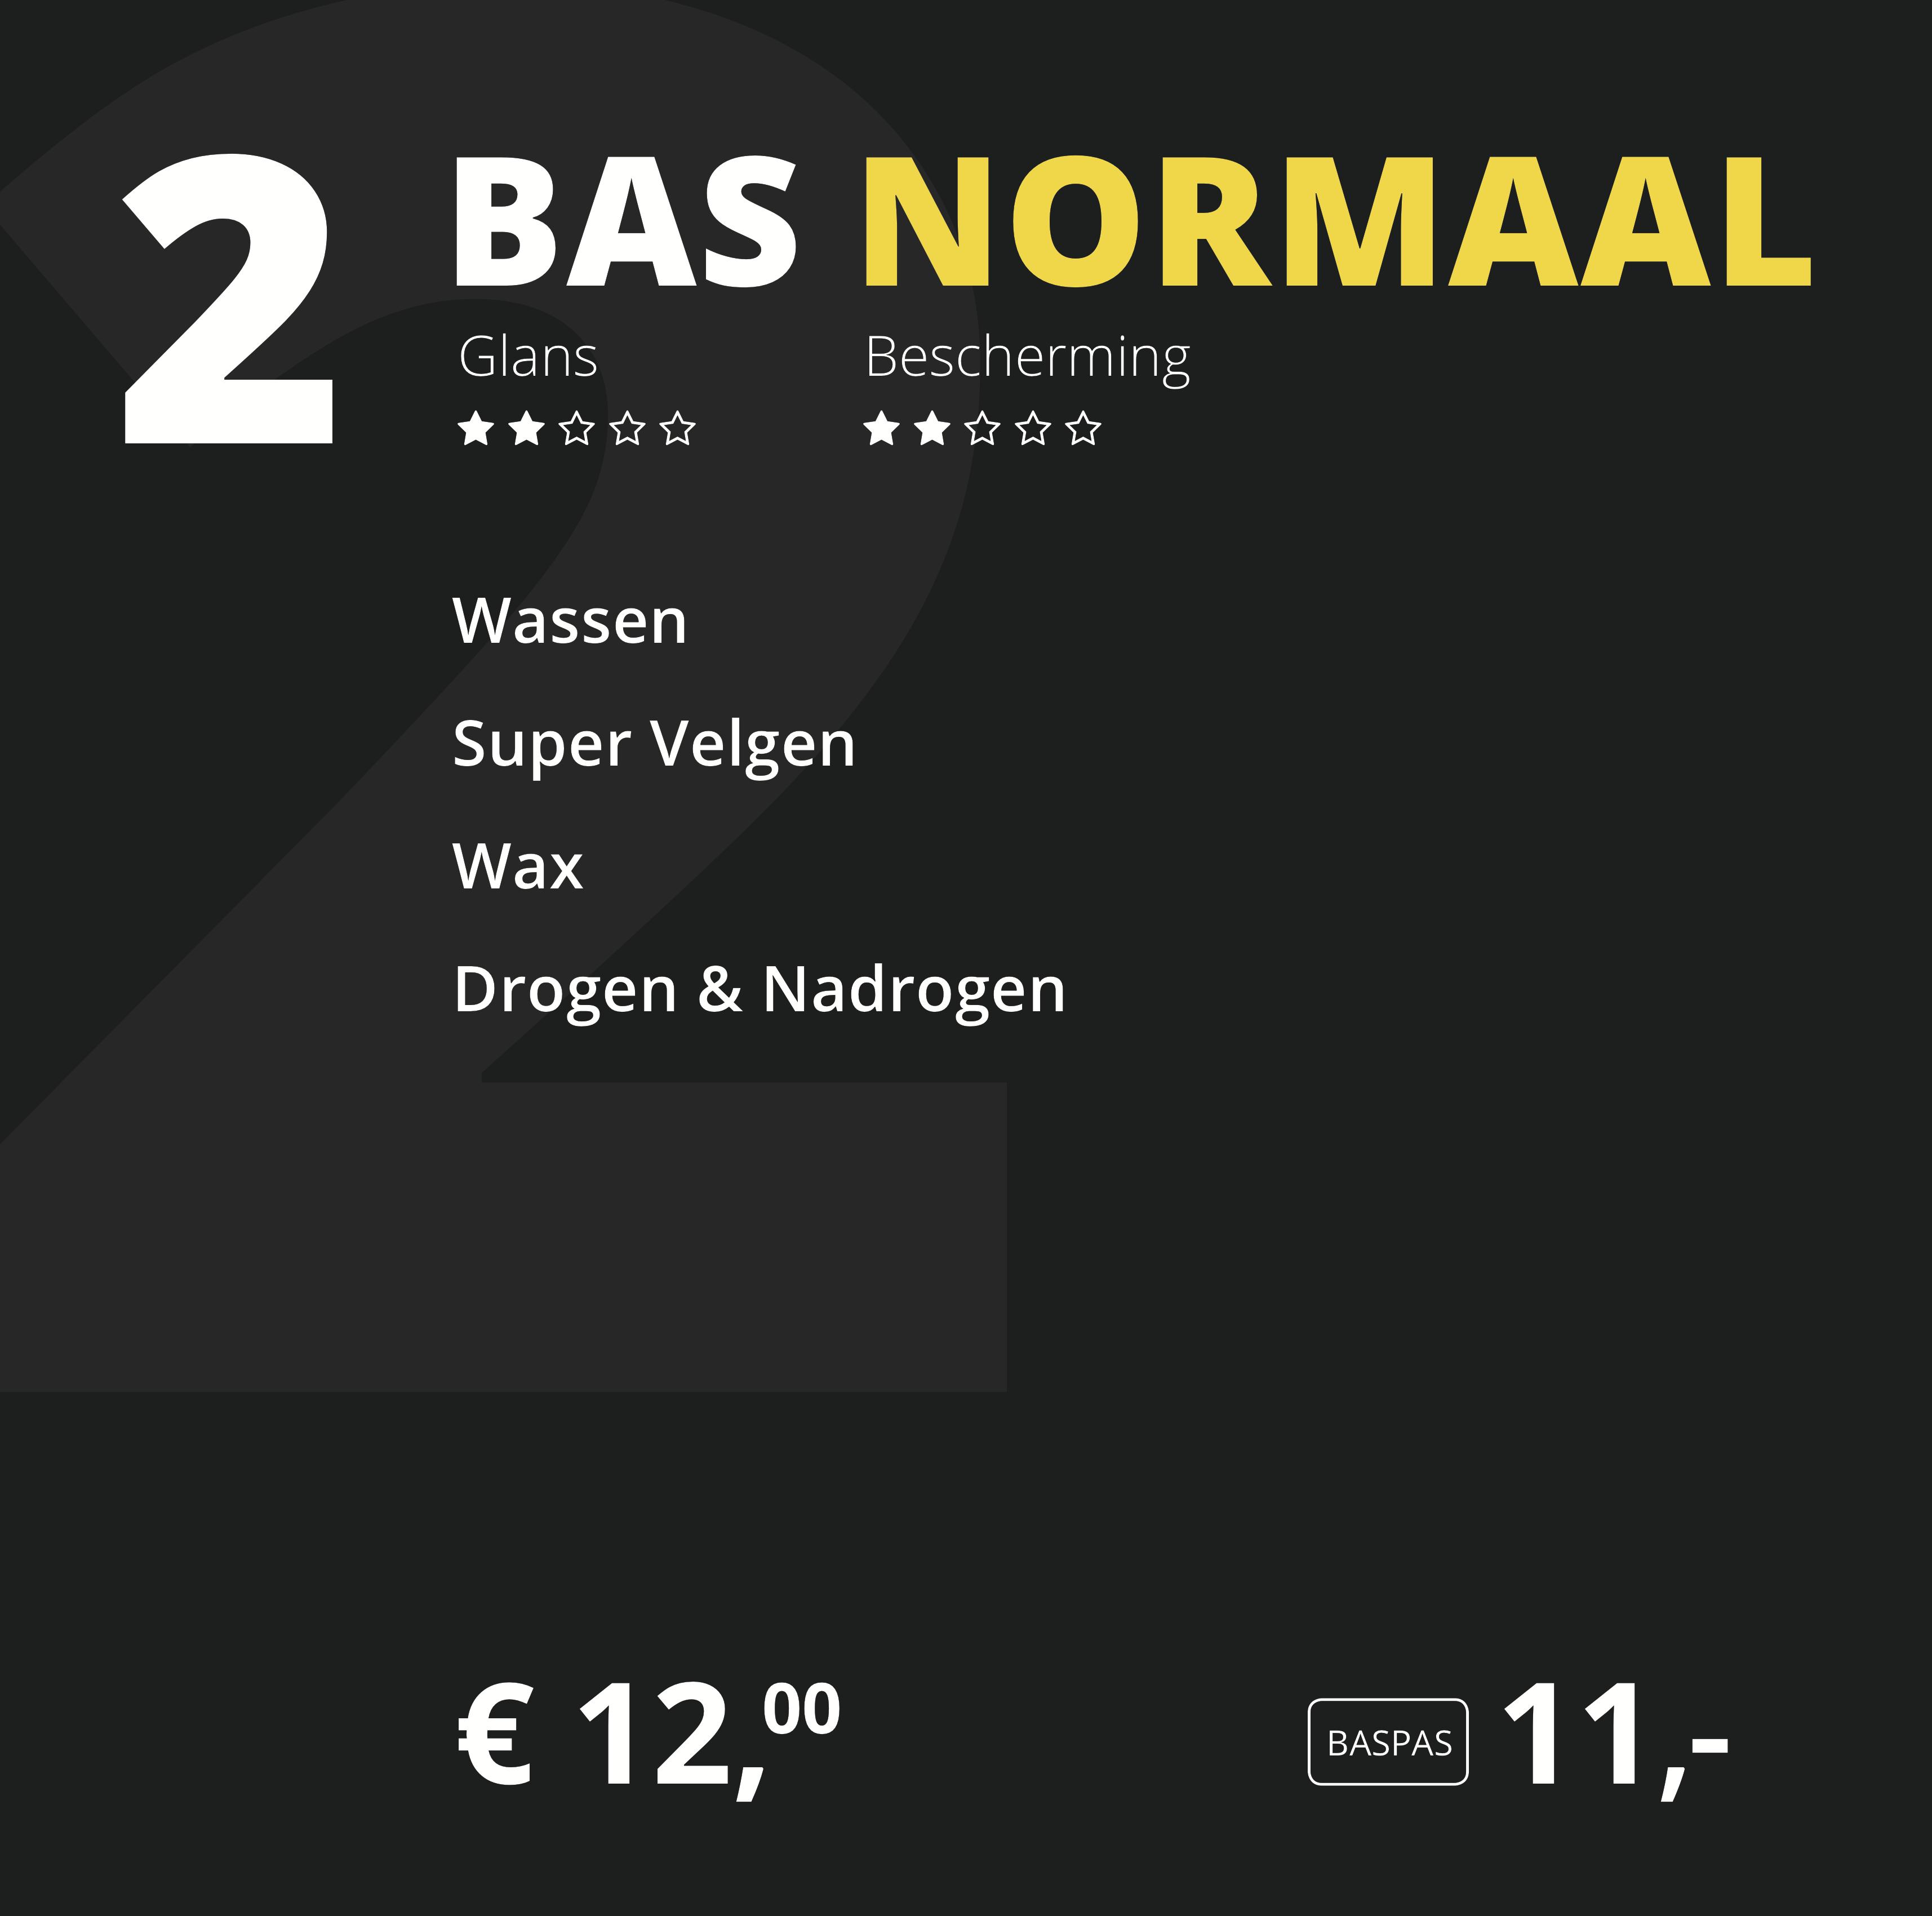 BasAutowas-Programma-2-Bas-Normaal